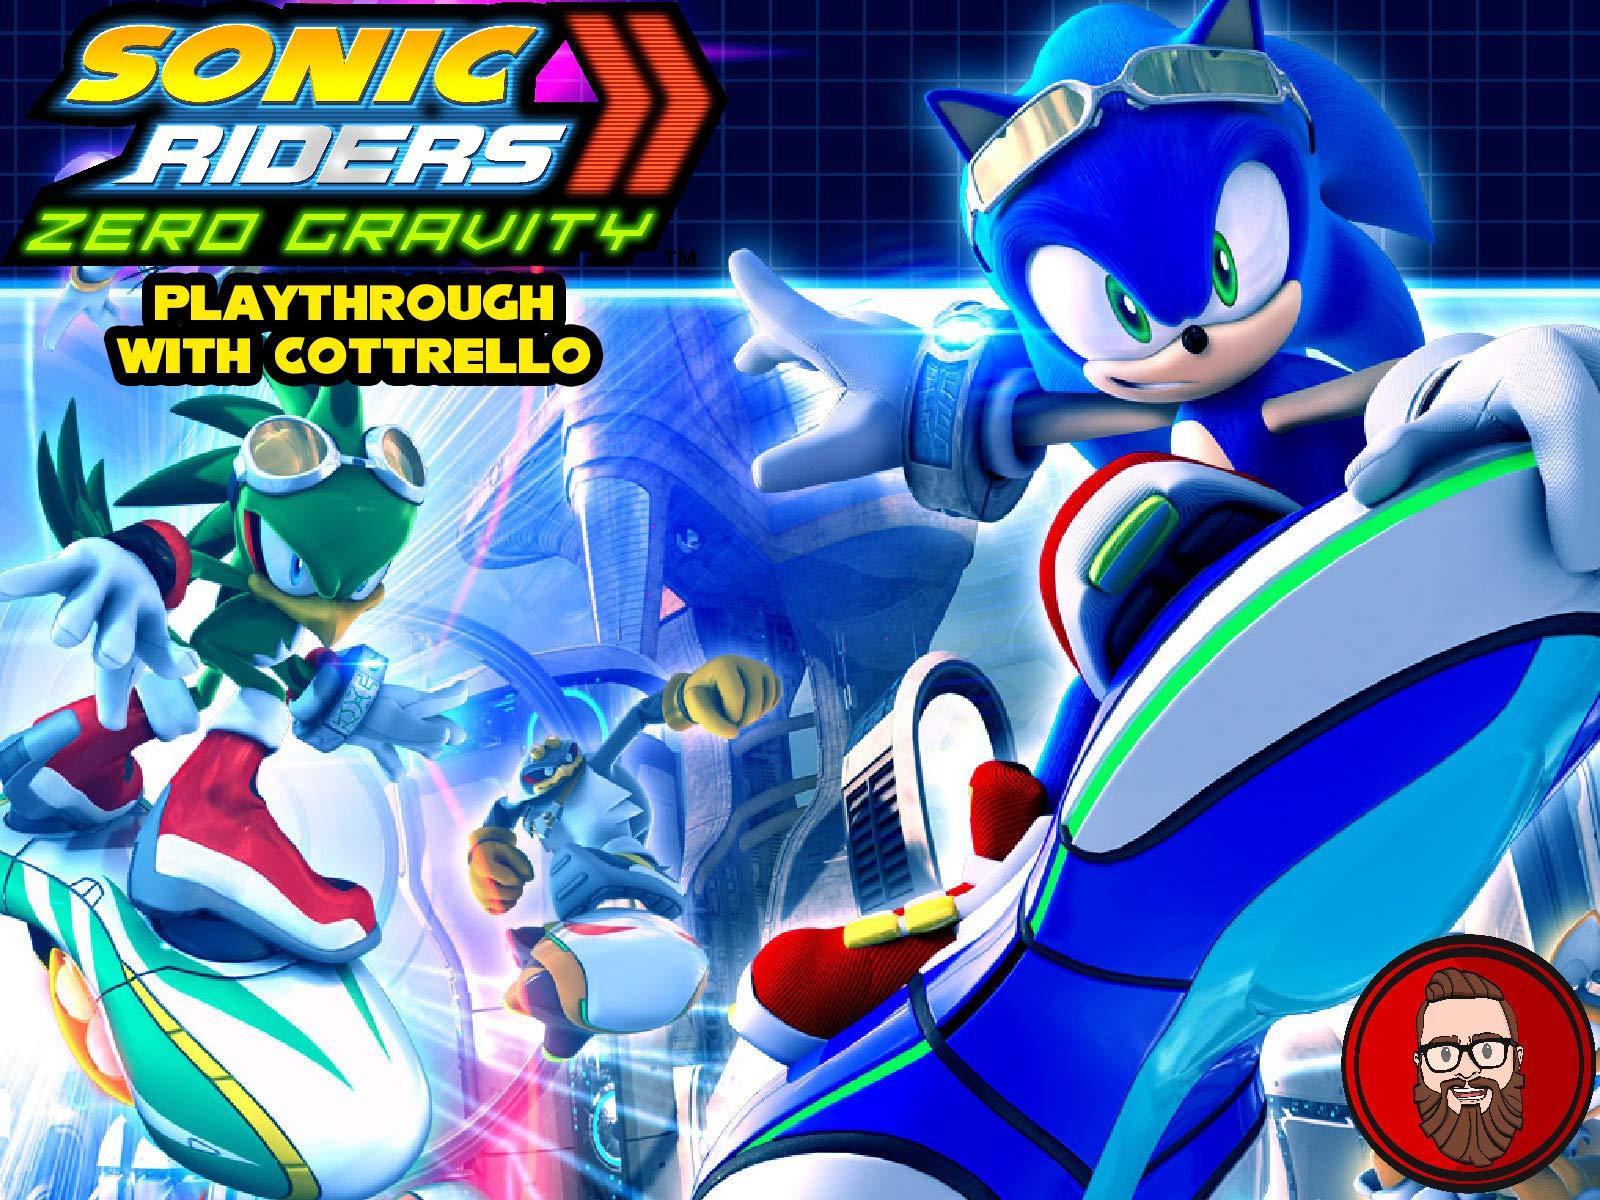 Amazon Com Watch Sonic Riders Zero Gravity Playthrough With Cottrello Prime Video